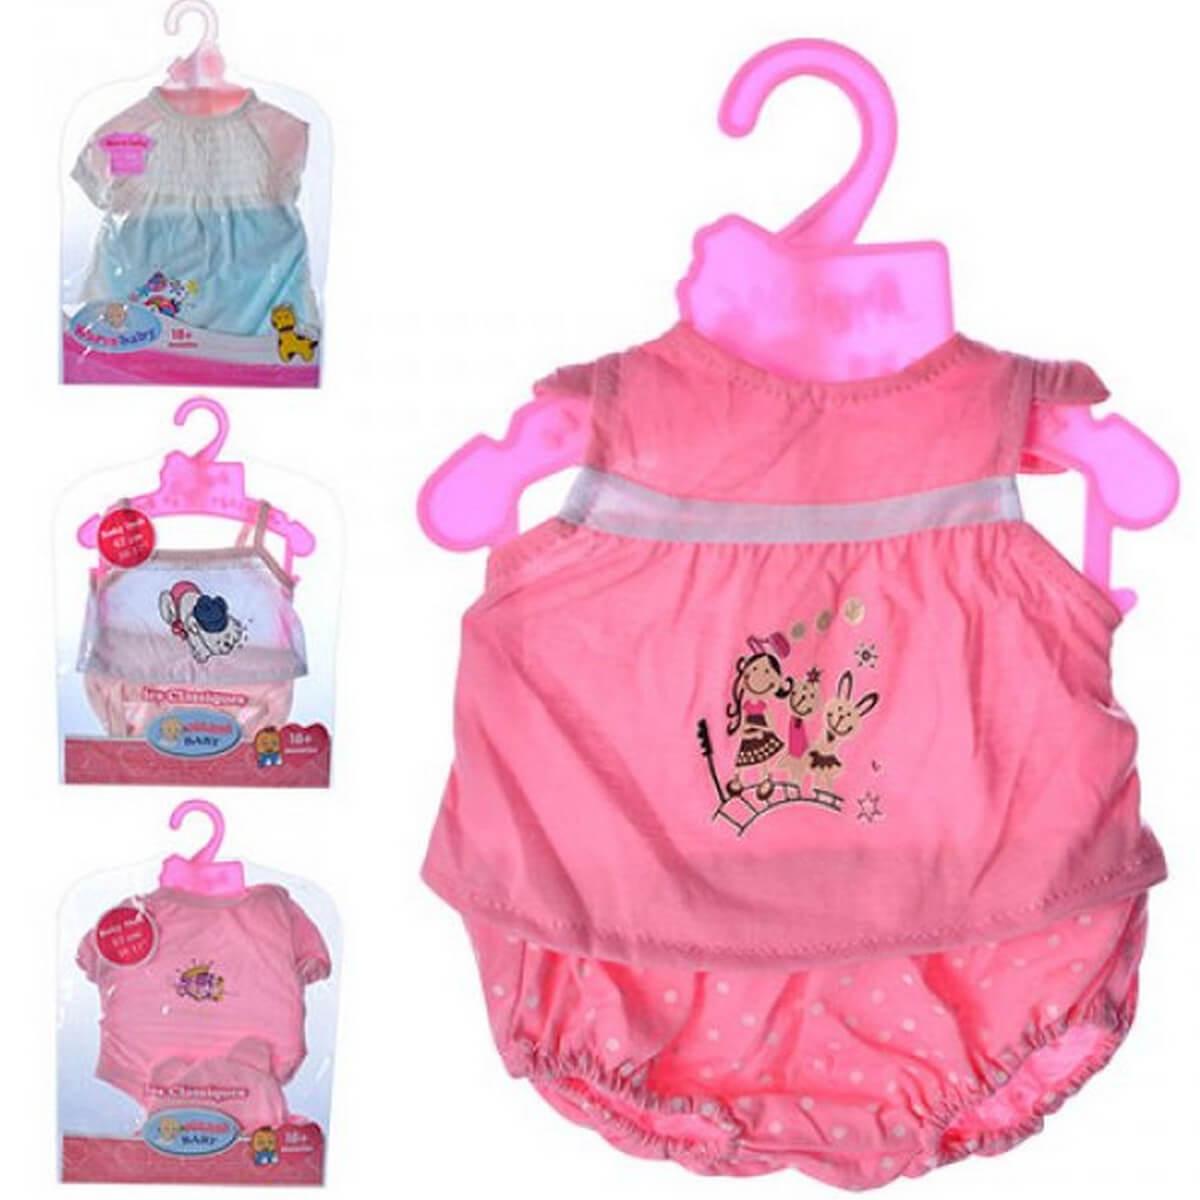 baby doll Одежда для пупса 4 вида на вешалке BJ-9005A-412-413-DBJ-440